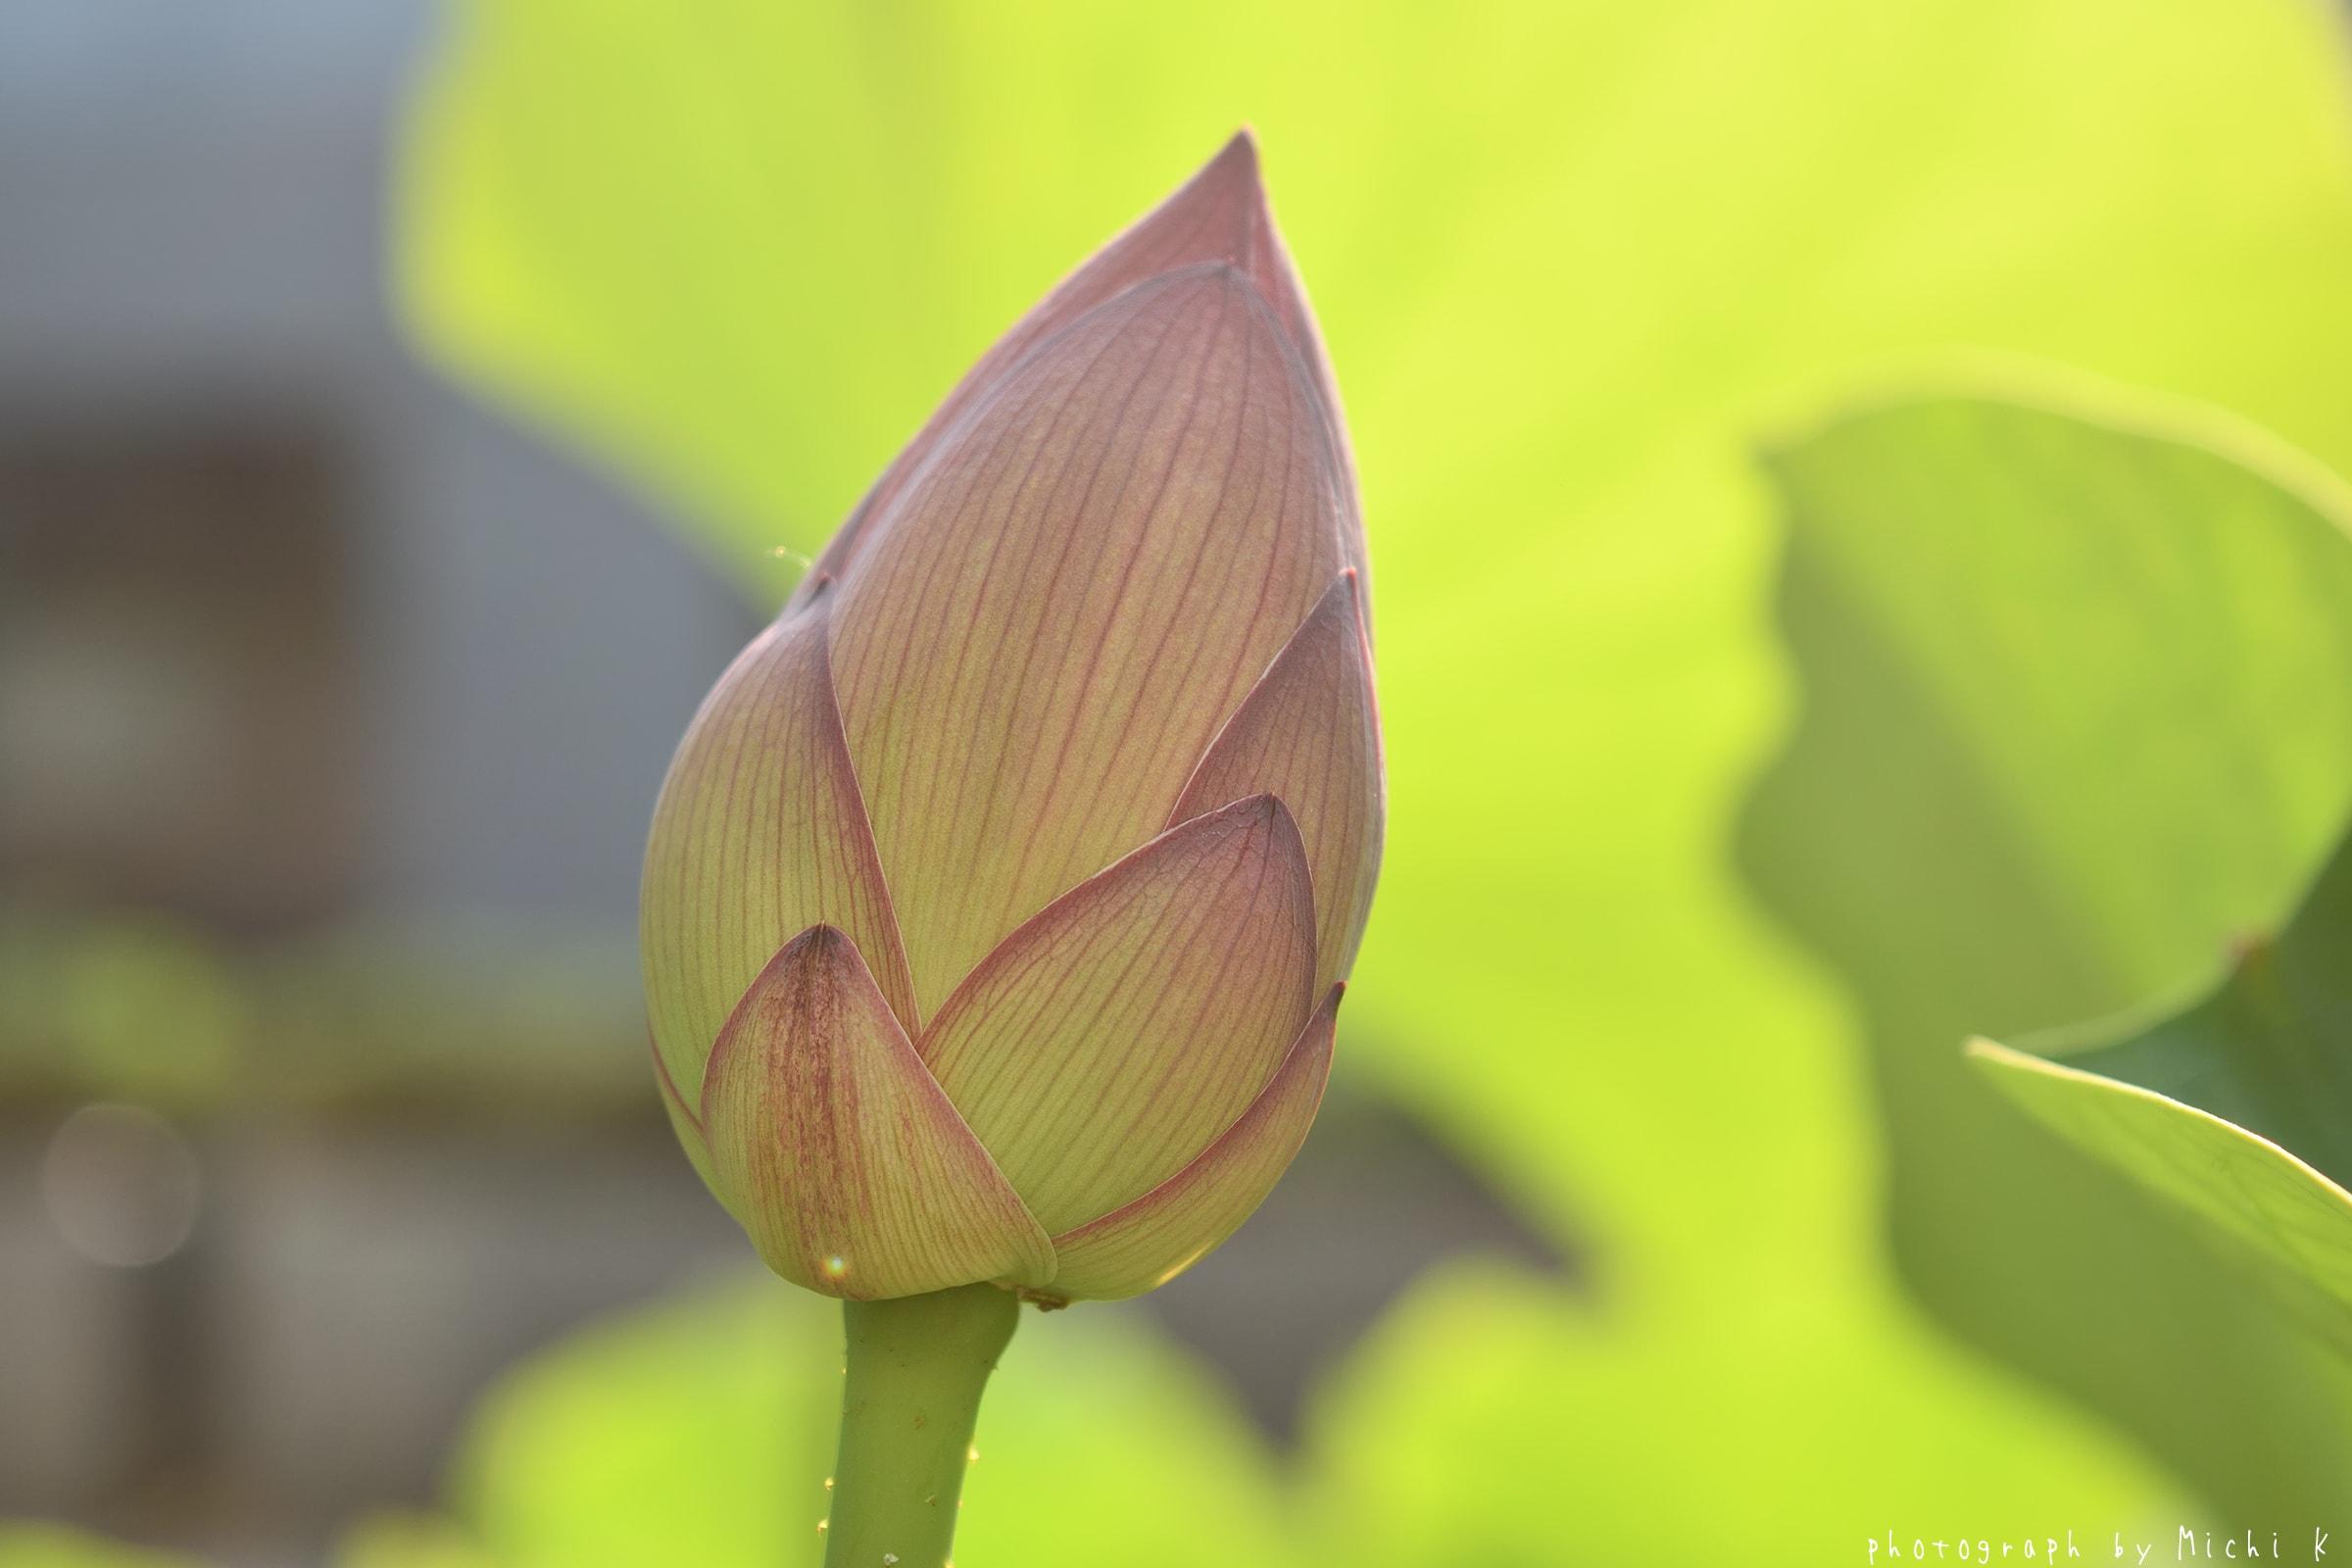 土門拳記念館2018-7-20朝(写真その3、奇跡の中尊寺蓮)